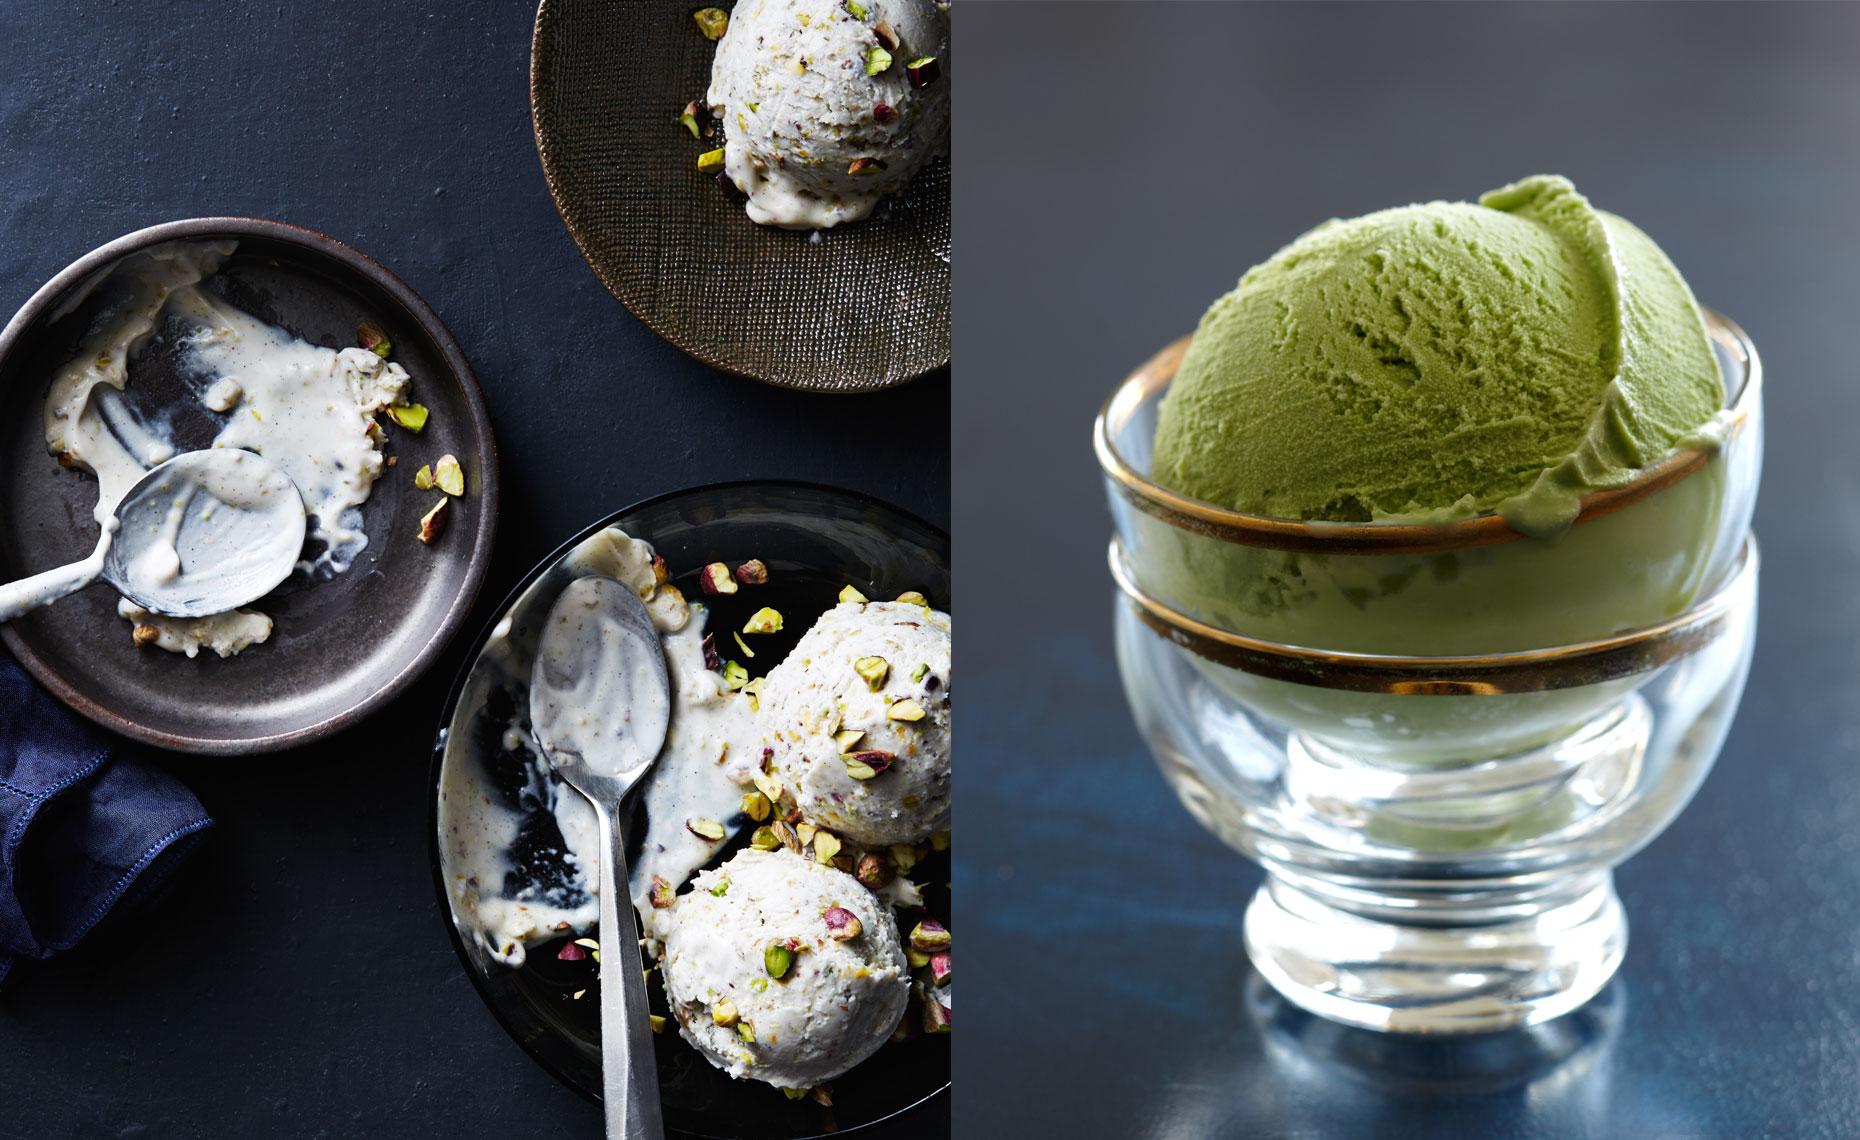 cauliflower-ice-cream-and-green-tea-ice-cream.jpg